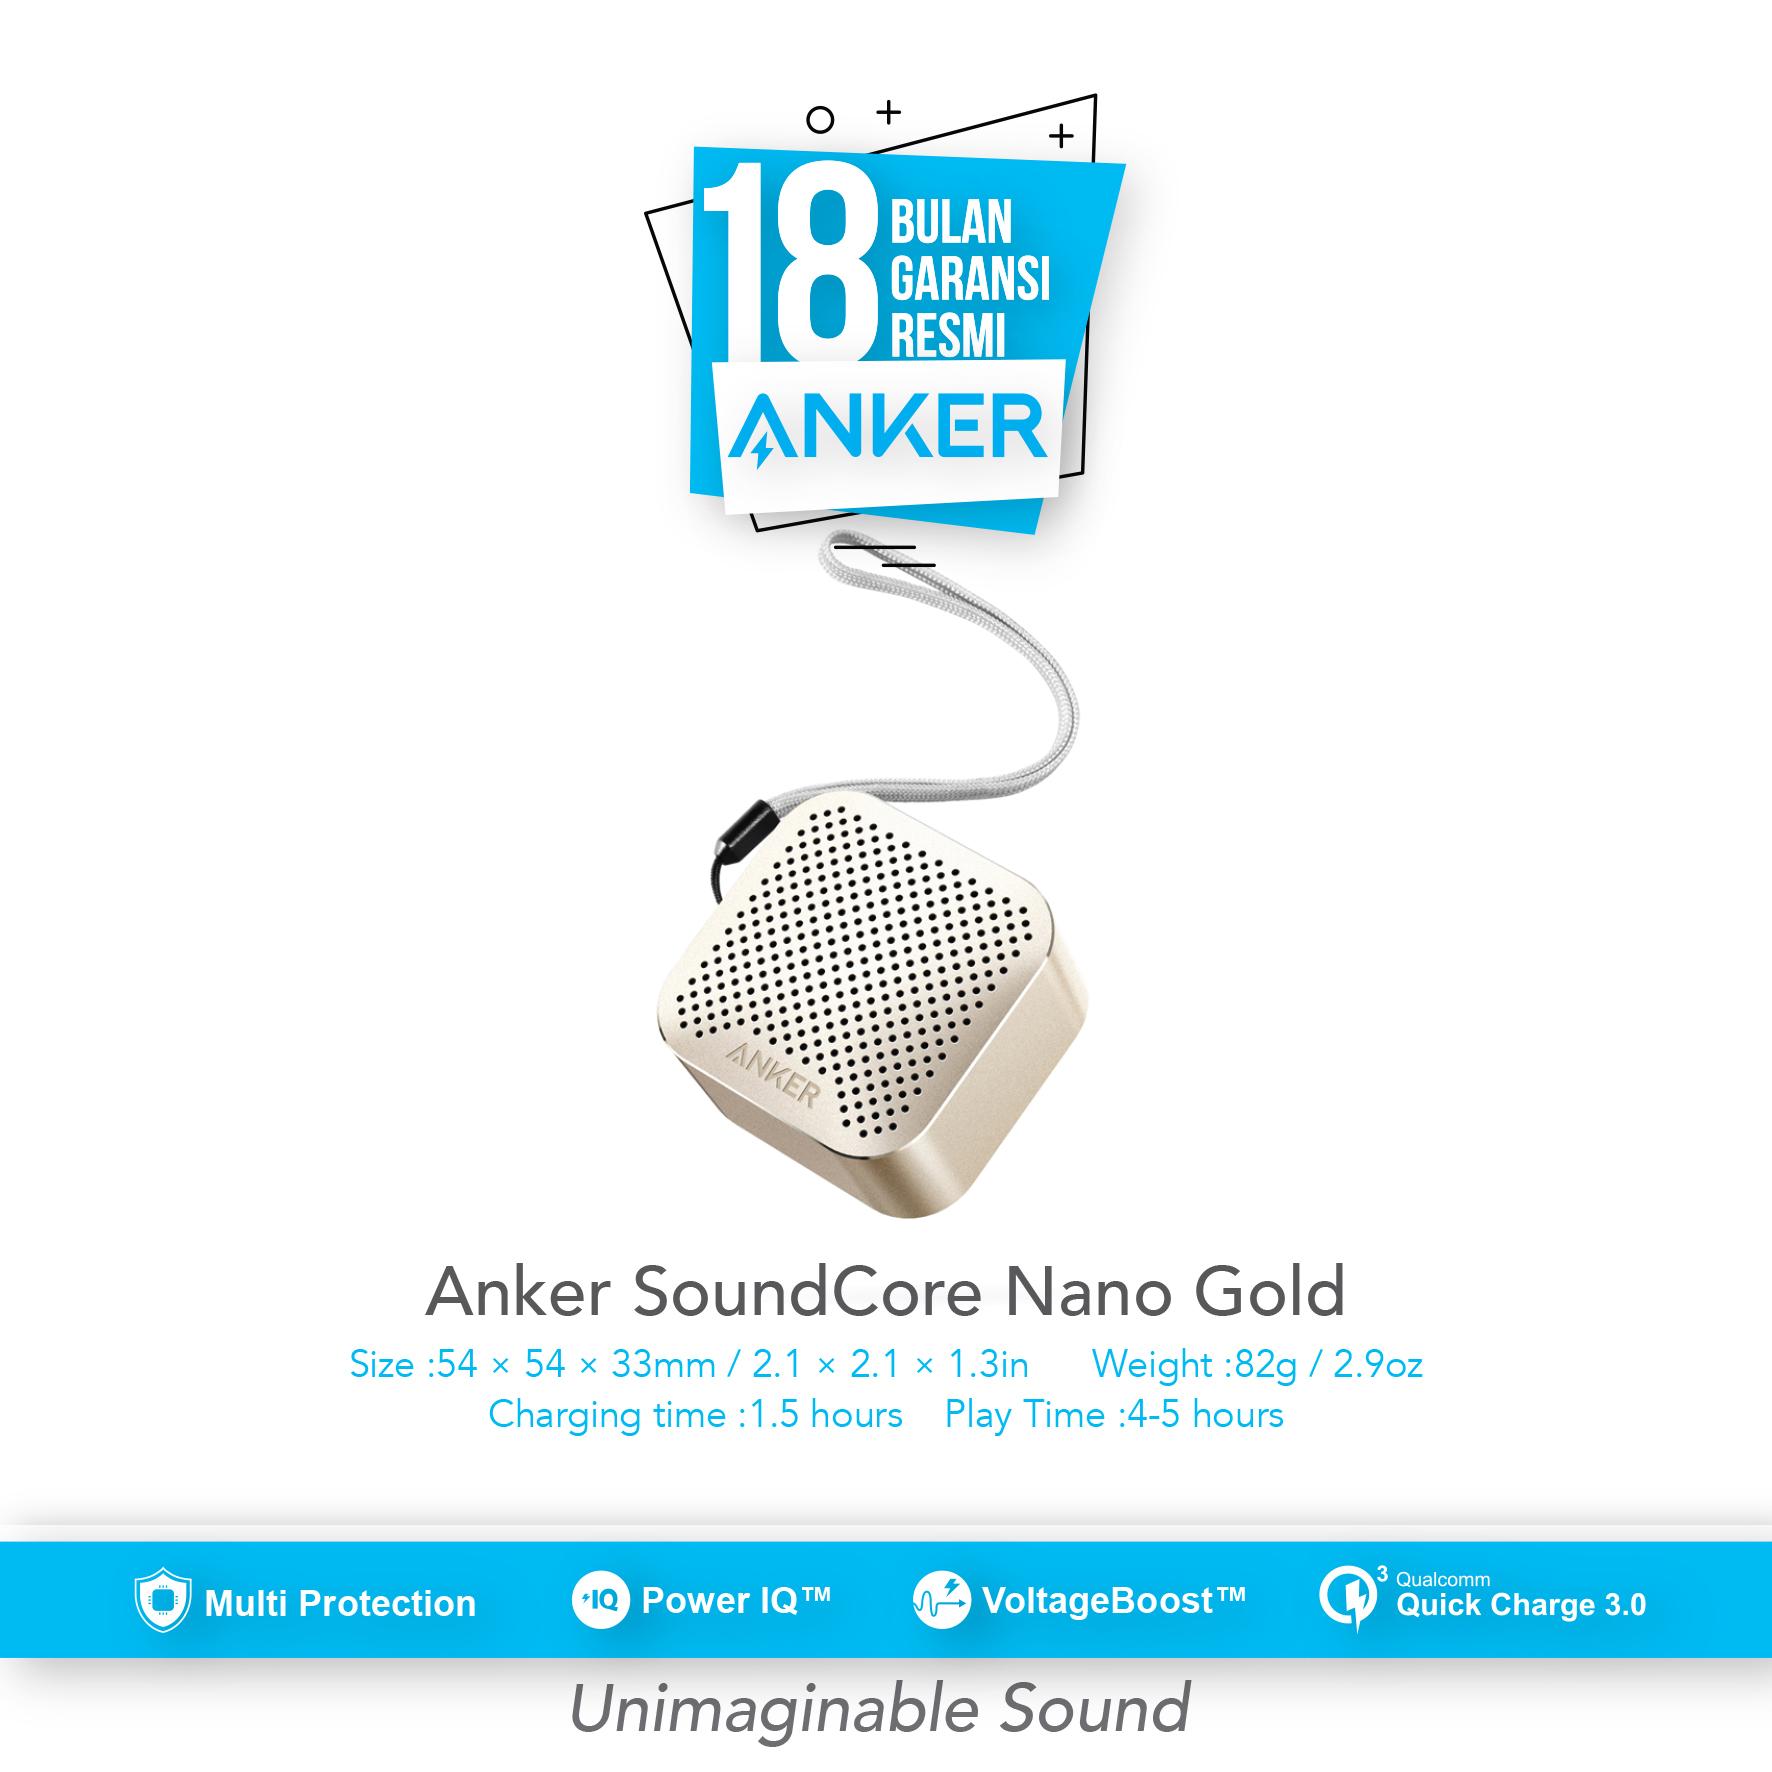 Jual Produk Anker Indonesia Official Online Termurah As Qr Satu Set Depan Belakang Soundcore Nano Wireless Speaker Gold A3104